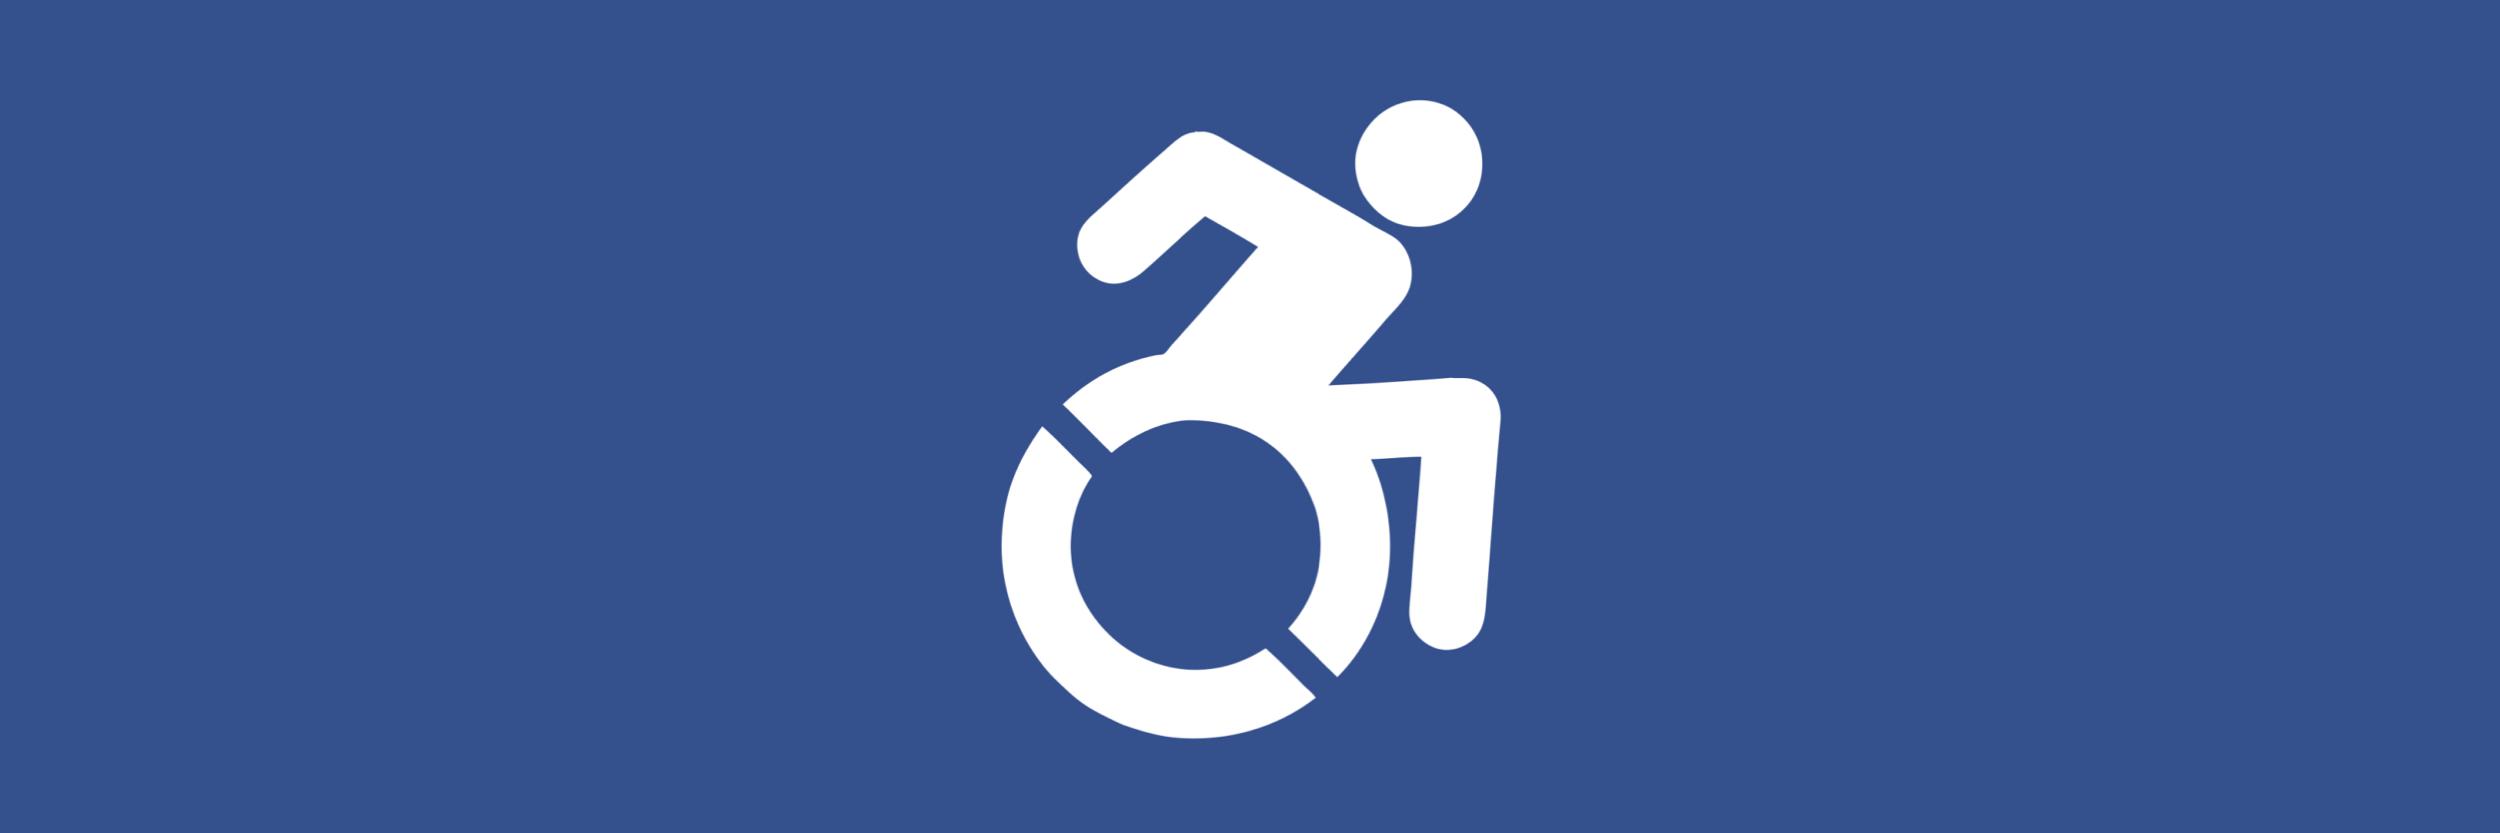 Church Accessibility